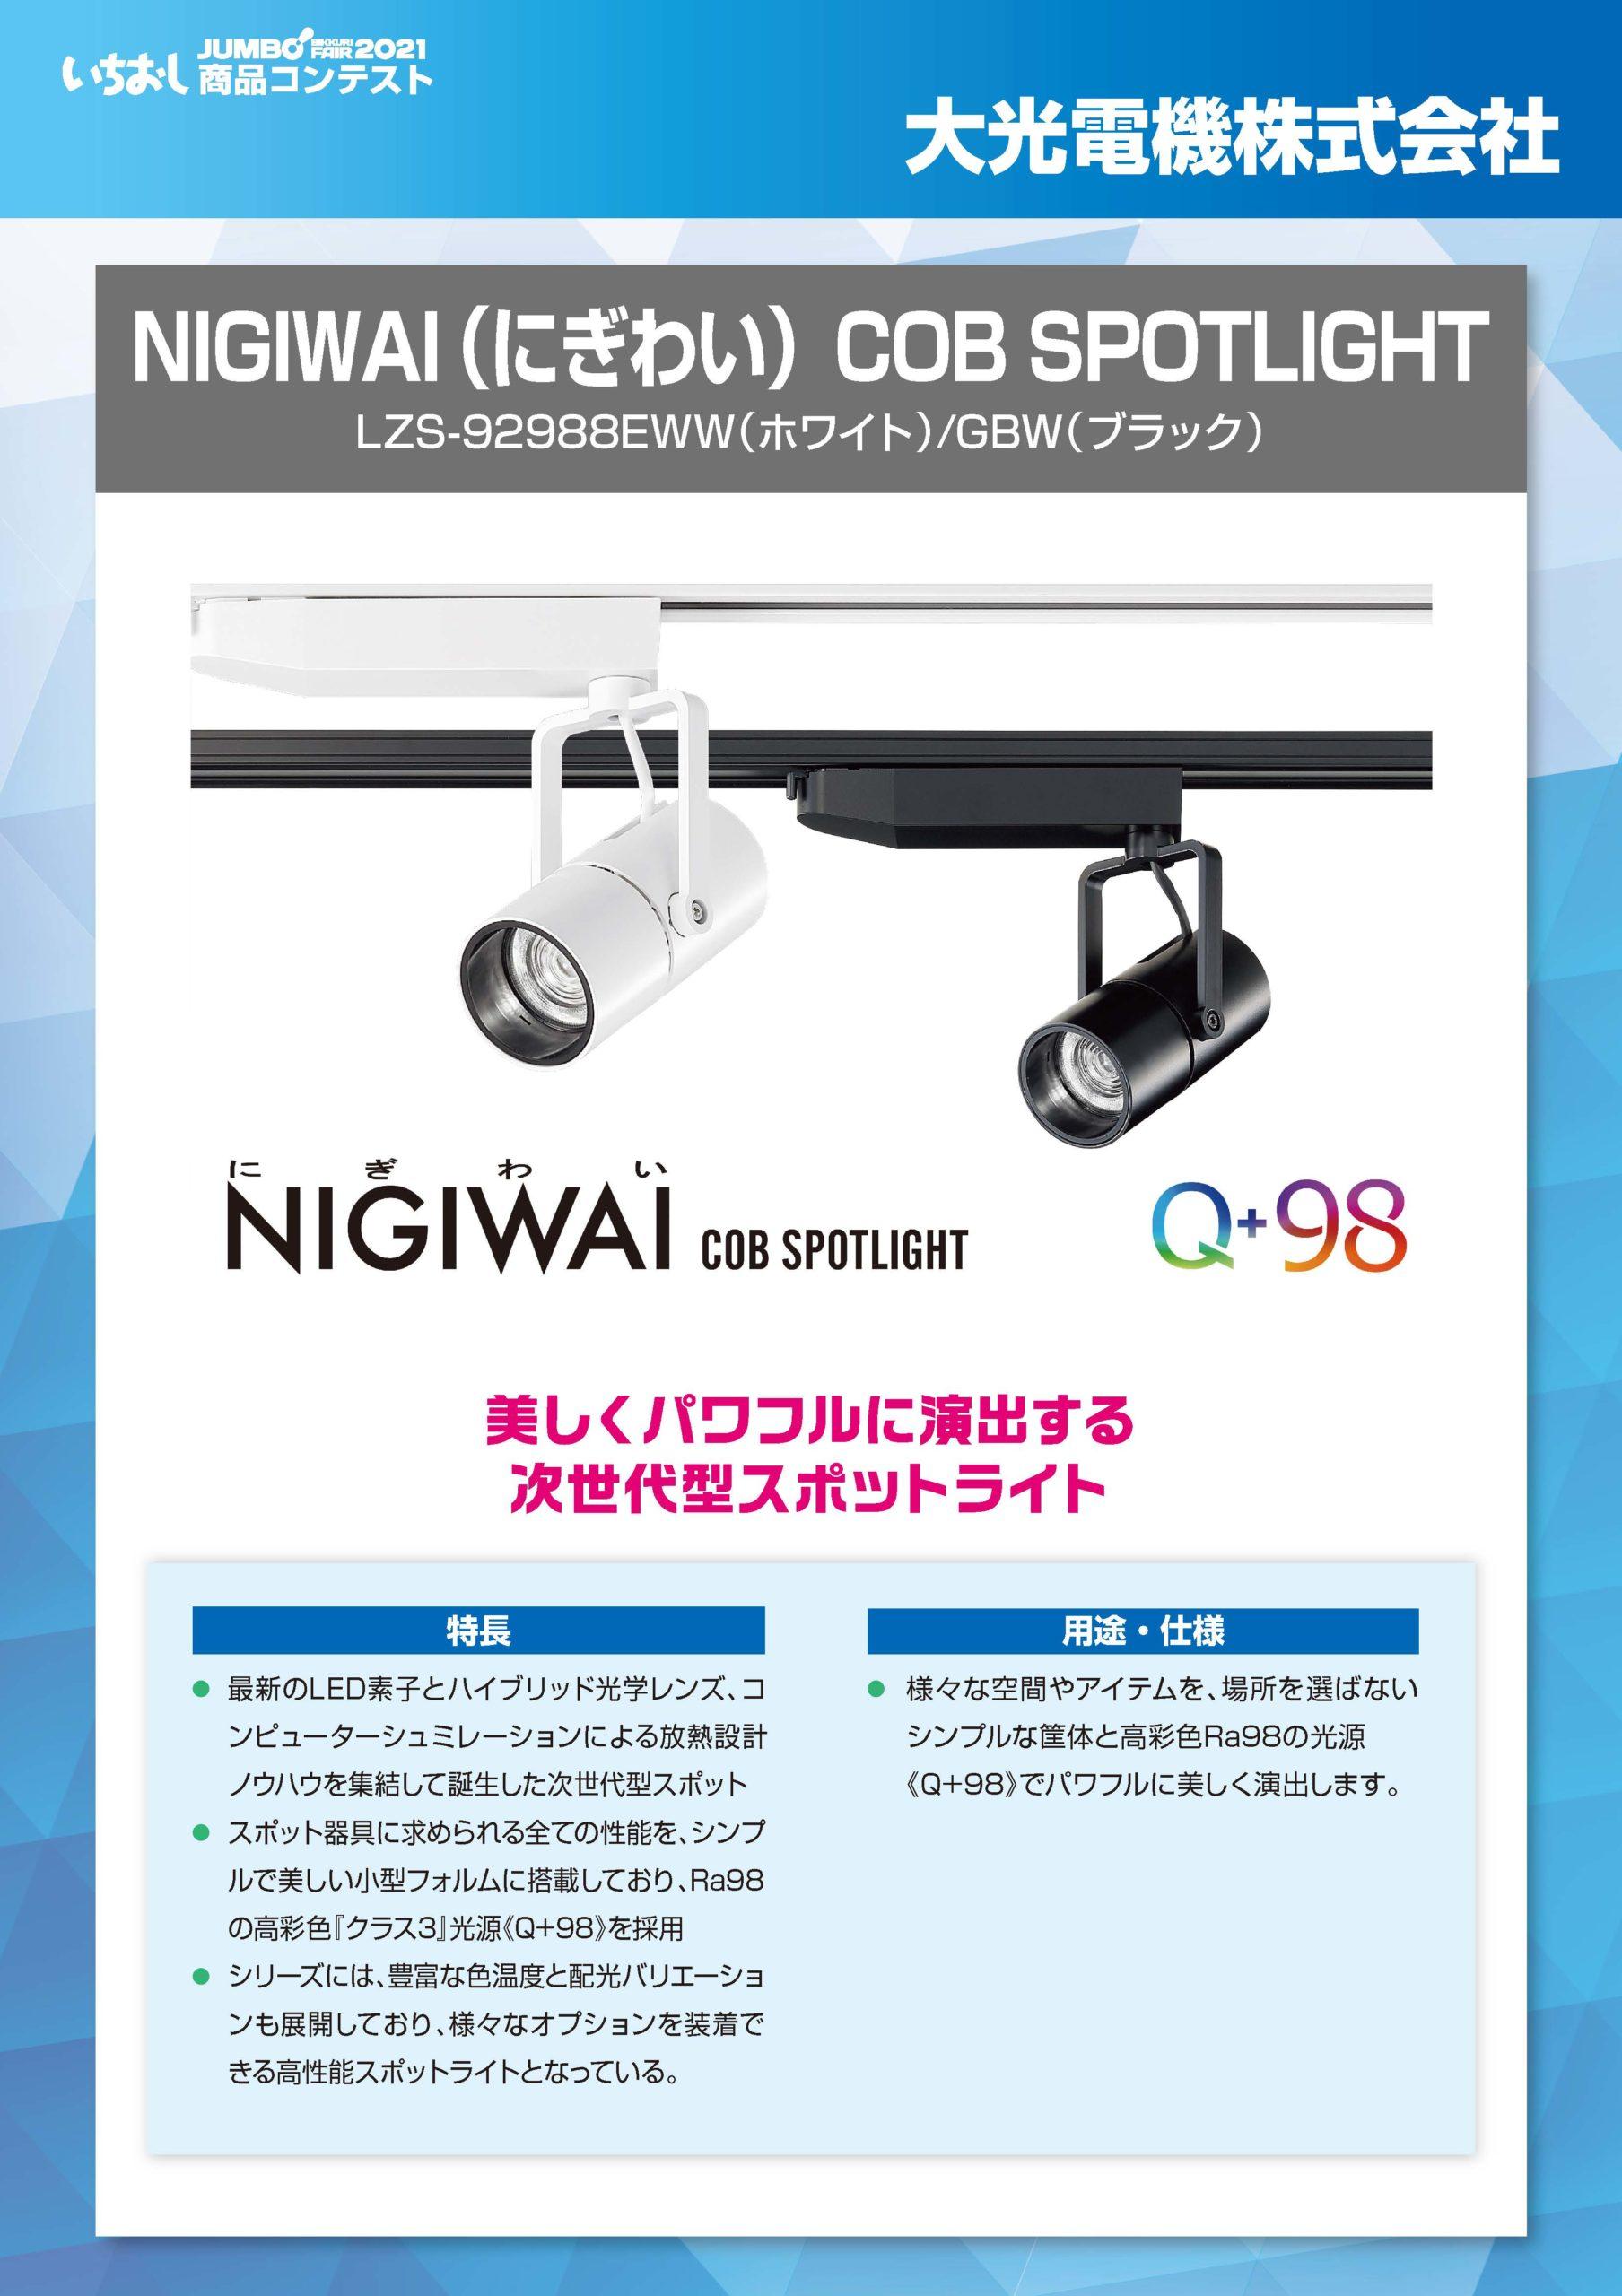 「NIGIWAI(にぎわい)COB SPOTLIGHT」大光電機株式会社の画像